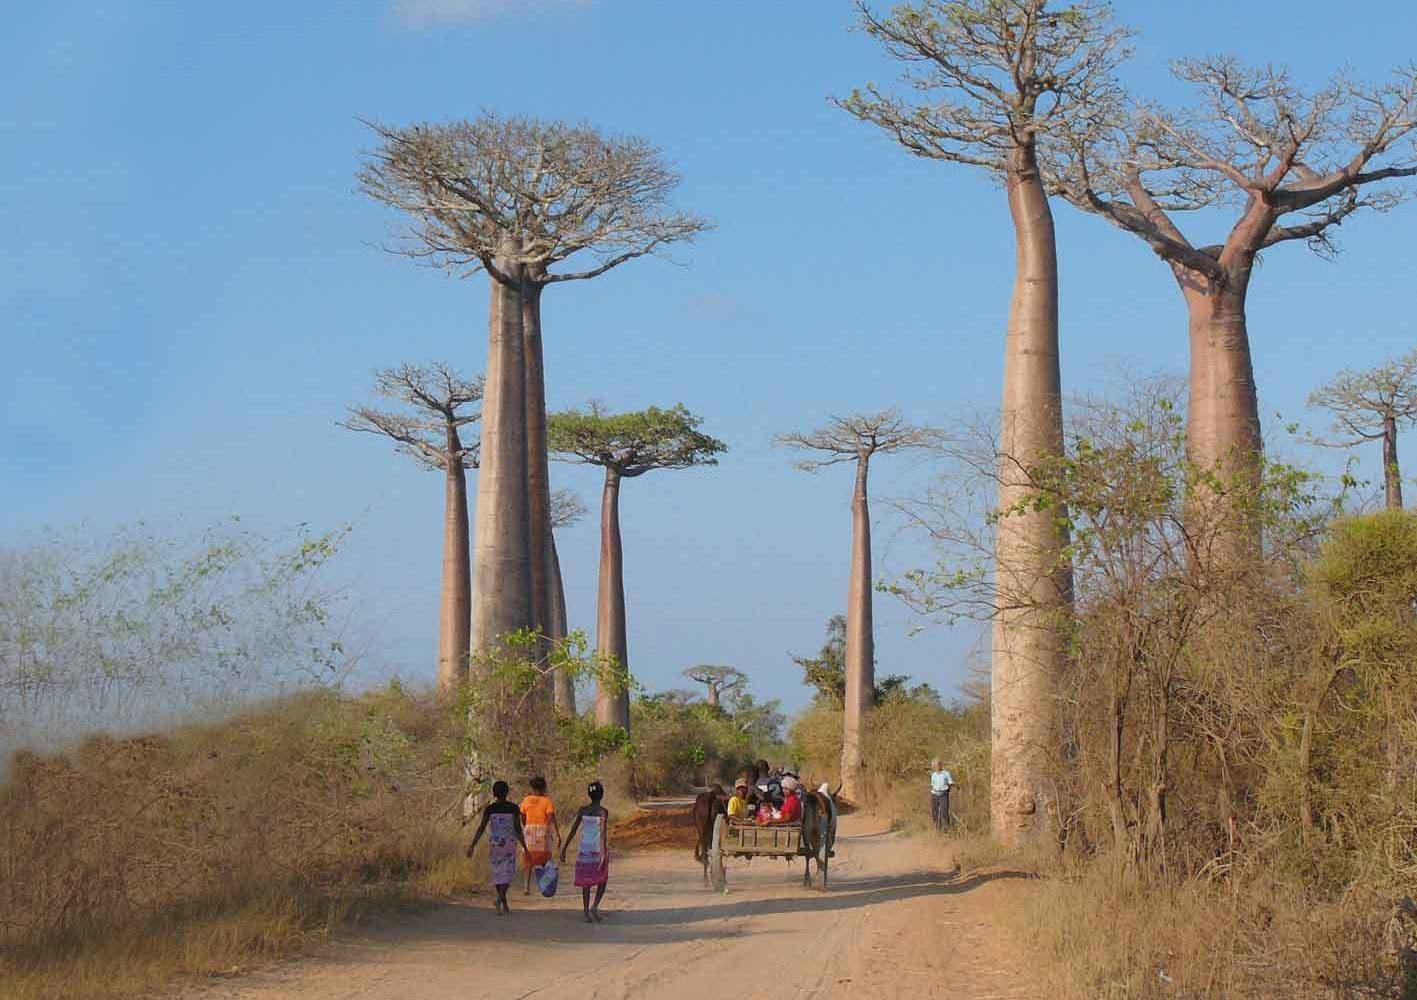 Berühmte Baobab-Allee bei Morondava, Madagaskar